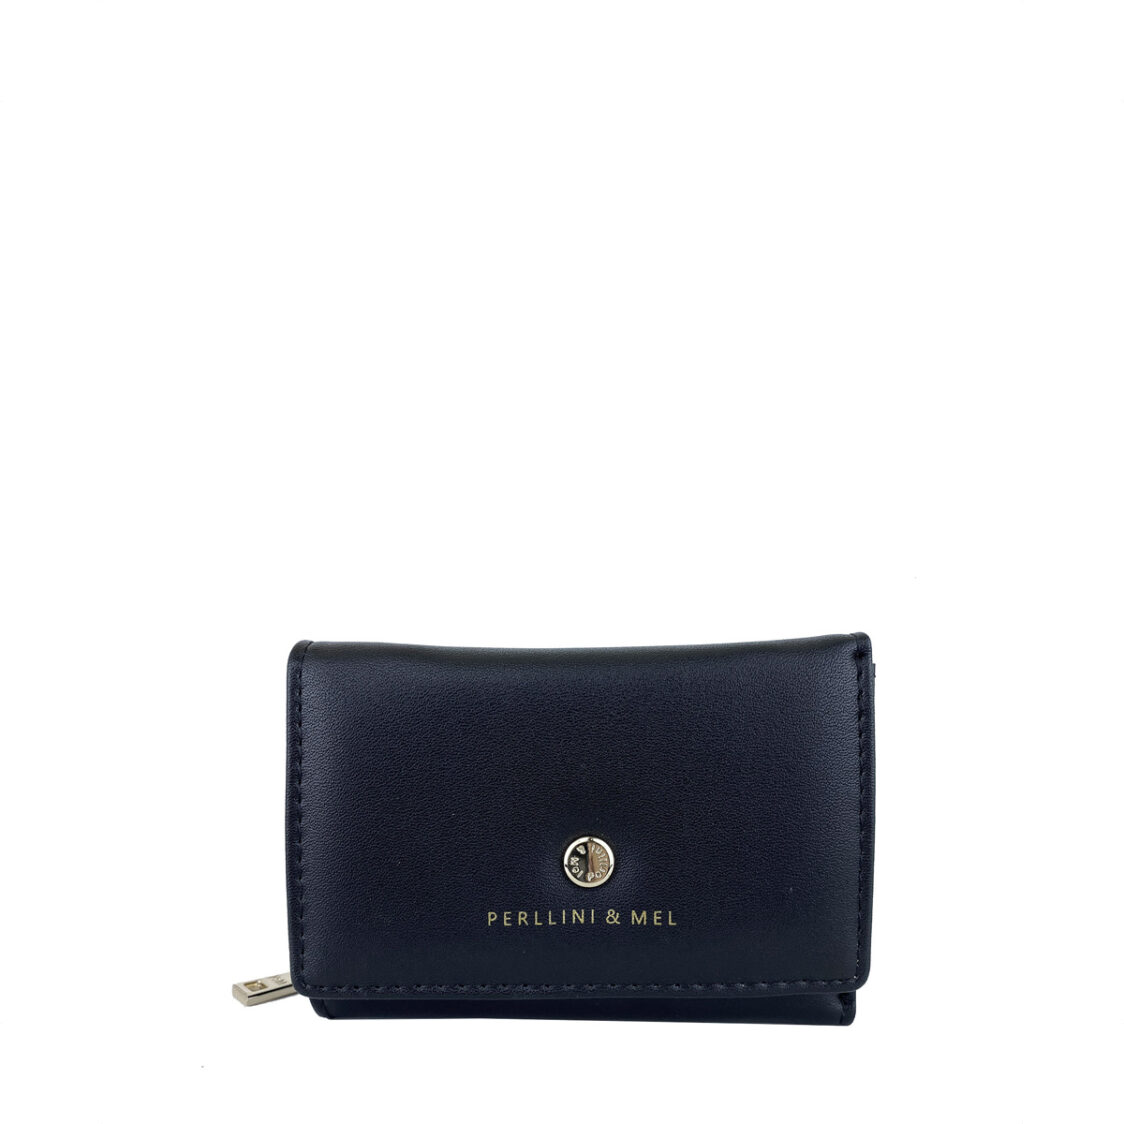 PerlliniMel Box Calf Leatherette Card Holder Wallet F Black